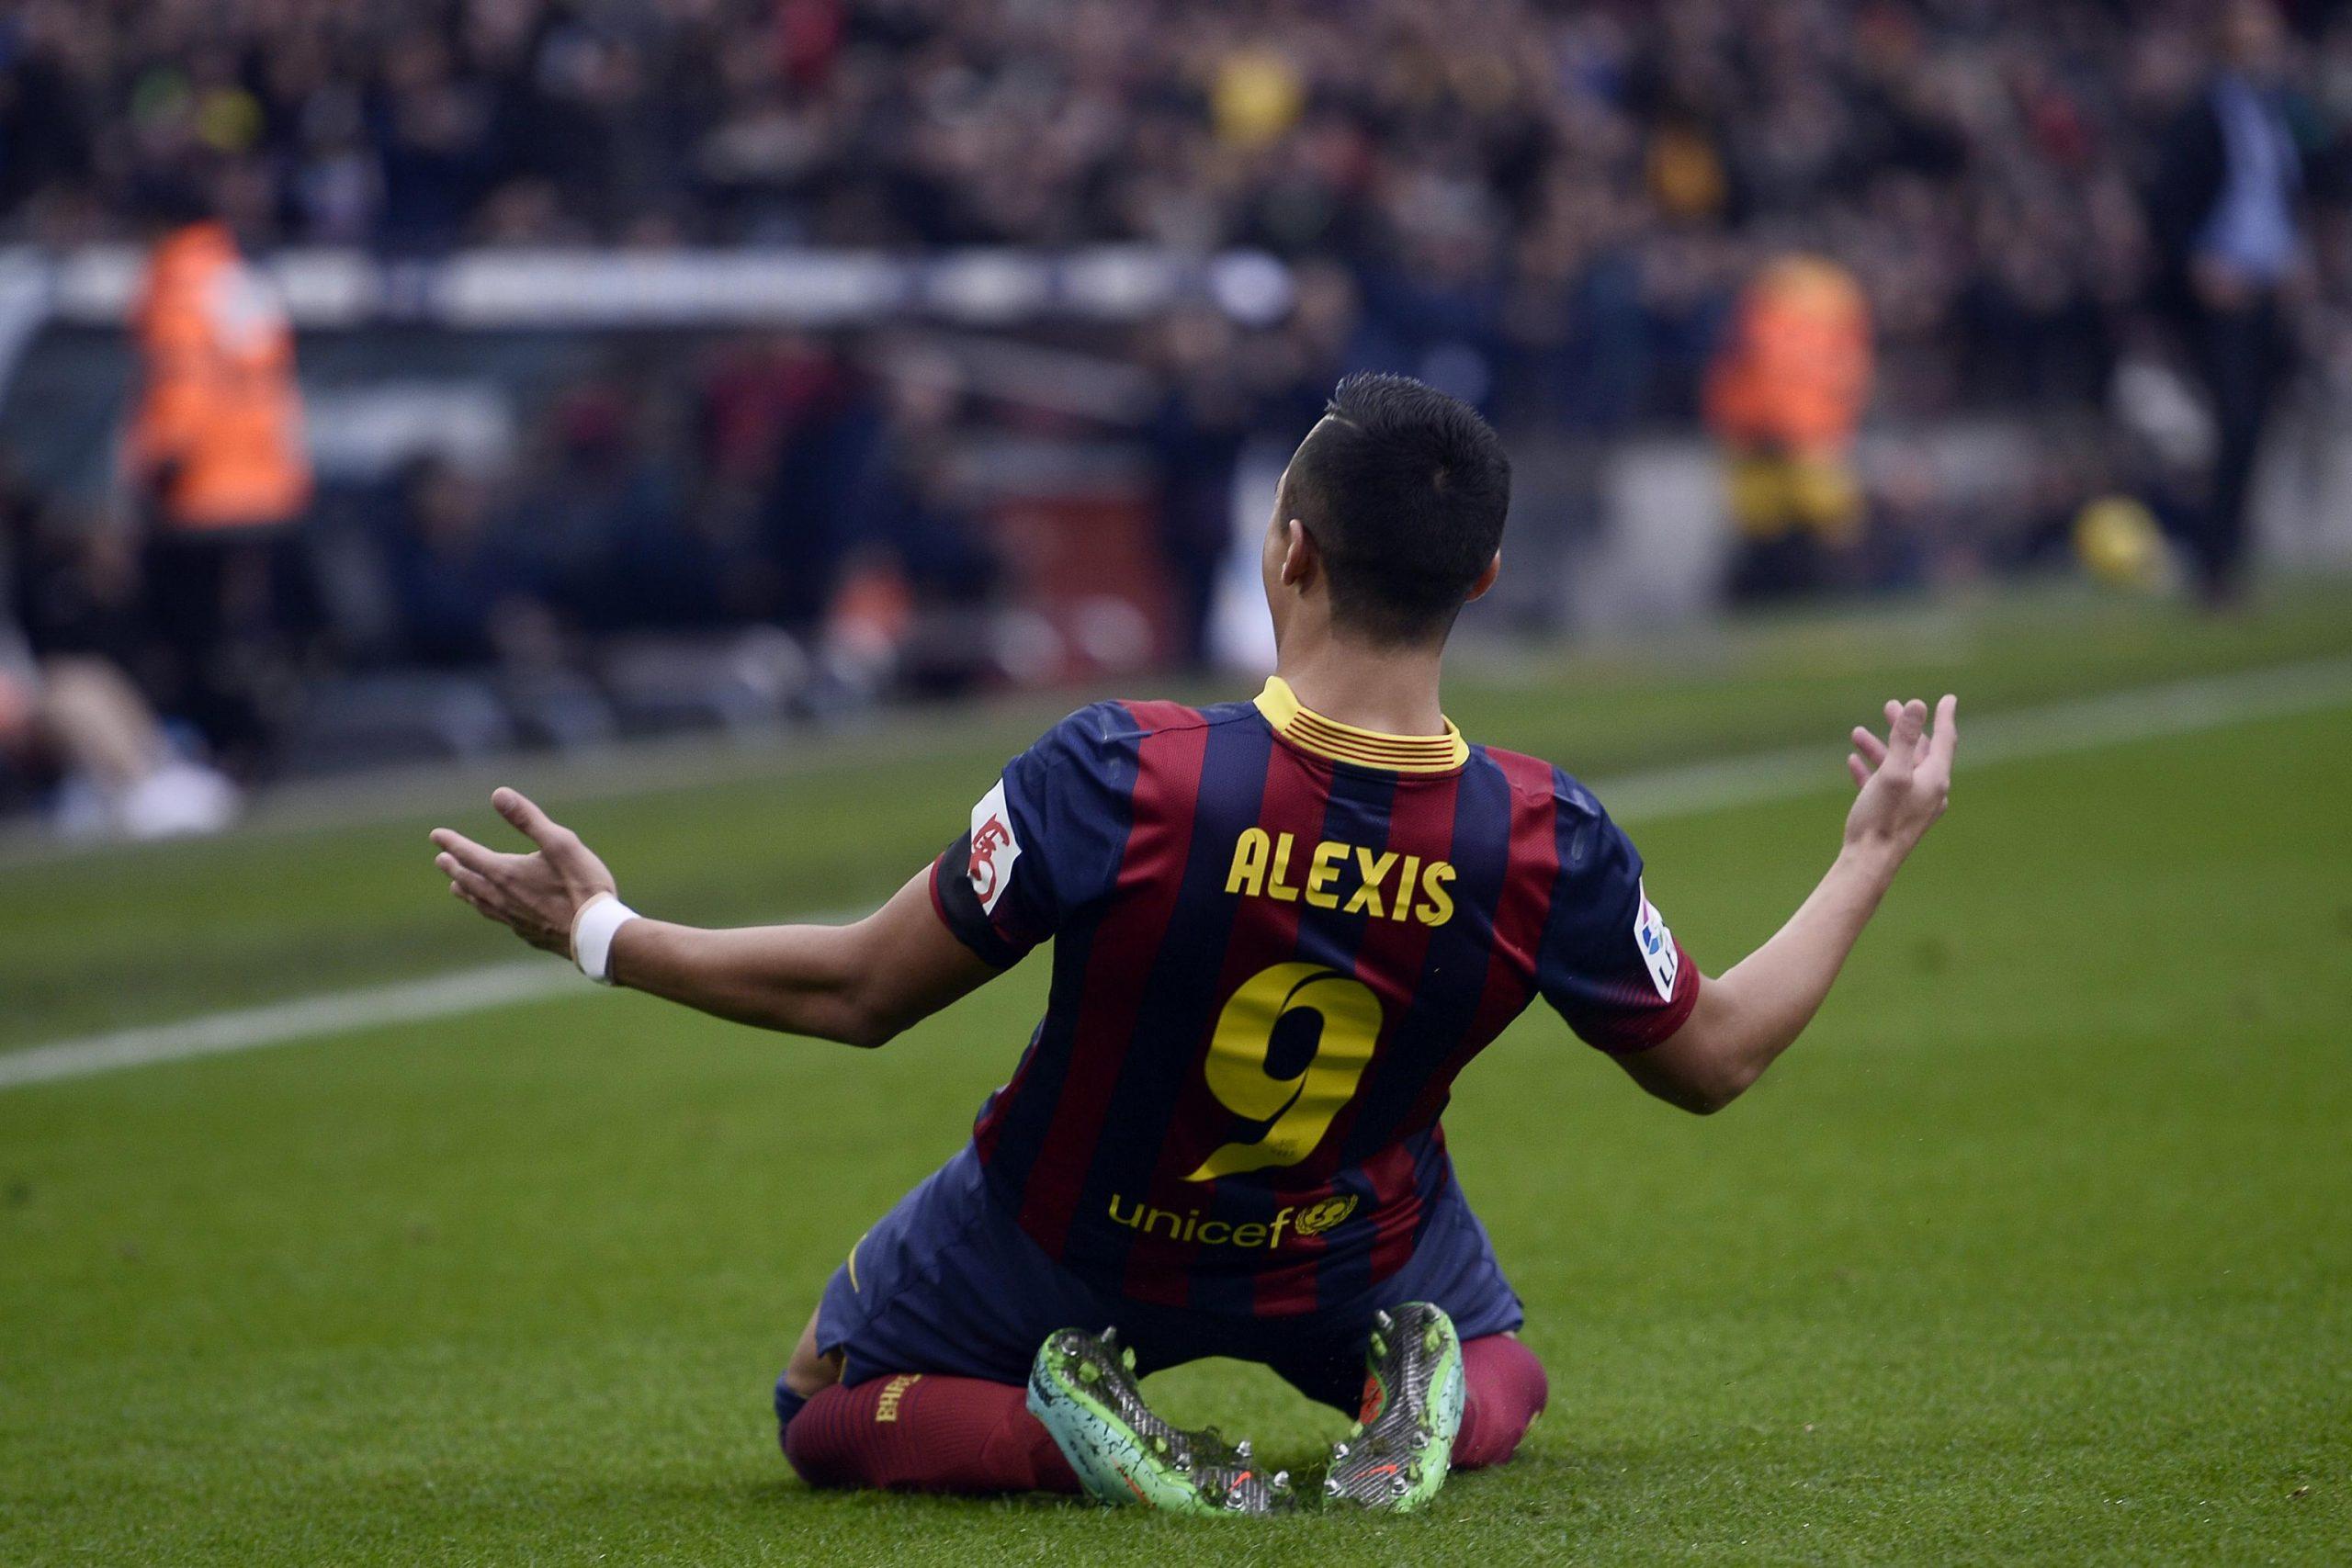 Barcelona po e mendon rikthimin e Alexis Sanchez